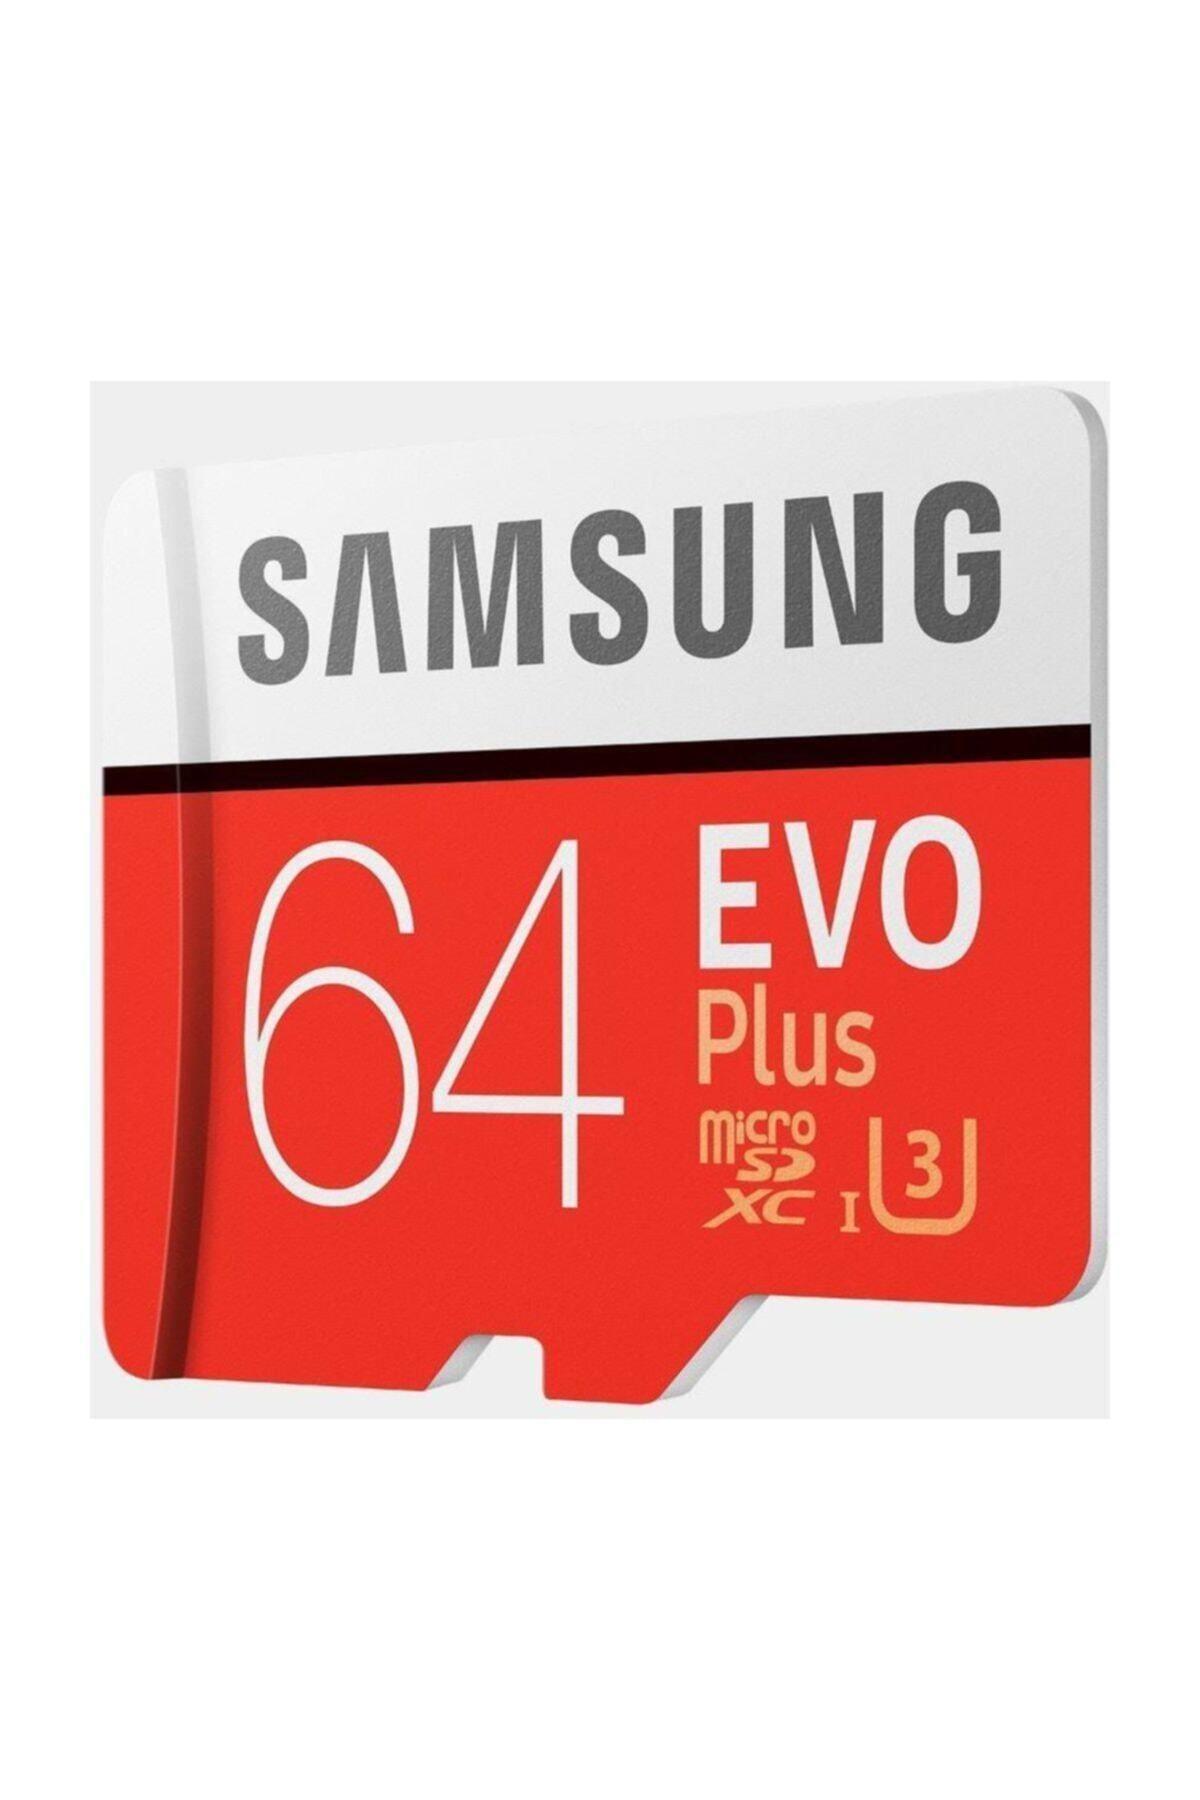 Samsung Evo Plus 64gb 100 Mb/s Microsdxc Kart Mb-mc64ga/tr 2